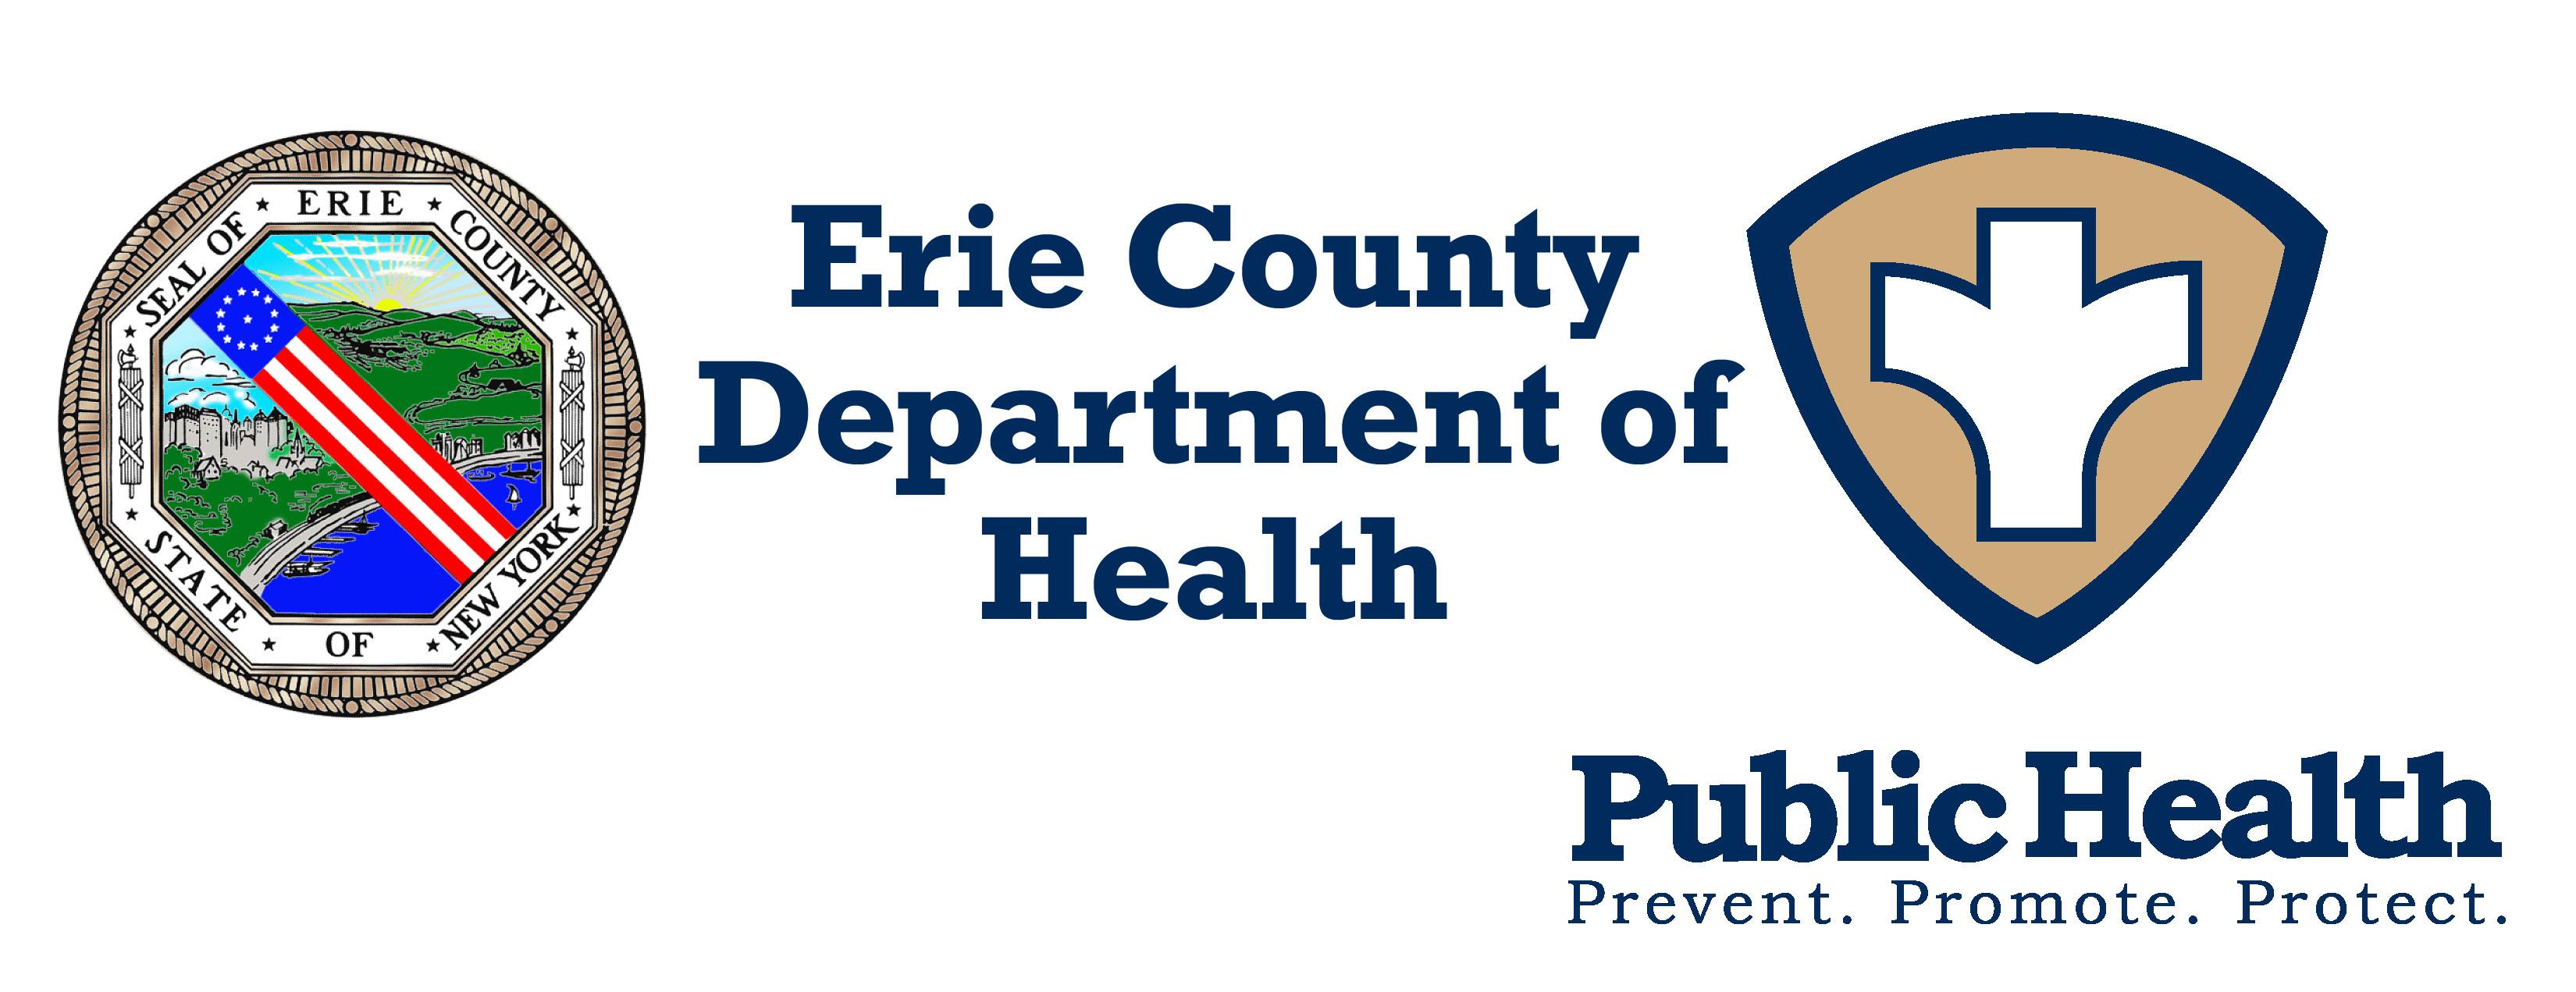 Logo of Erie County Health Dept. & Public Health logo